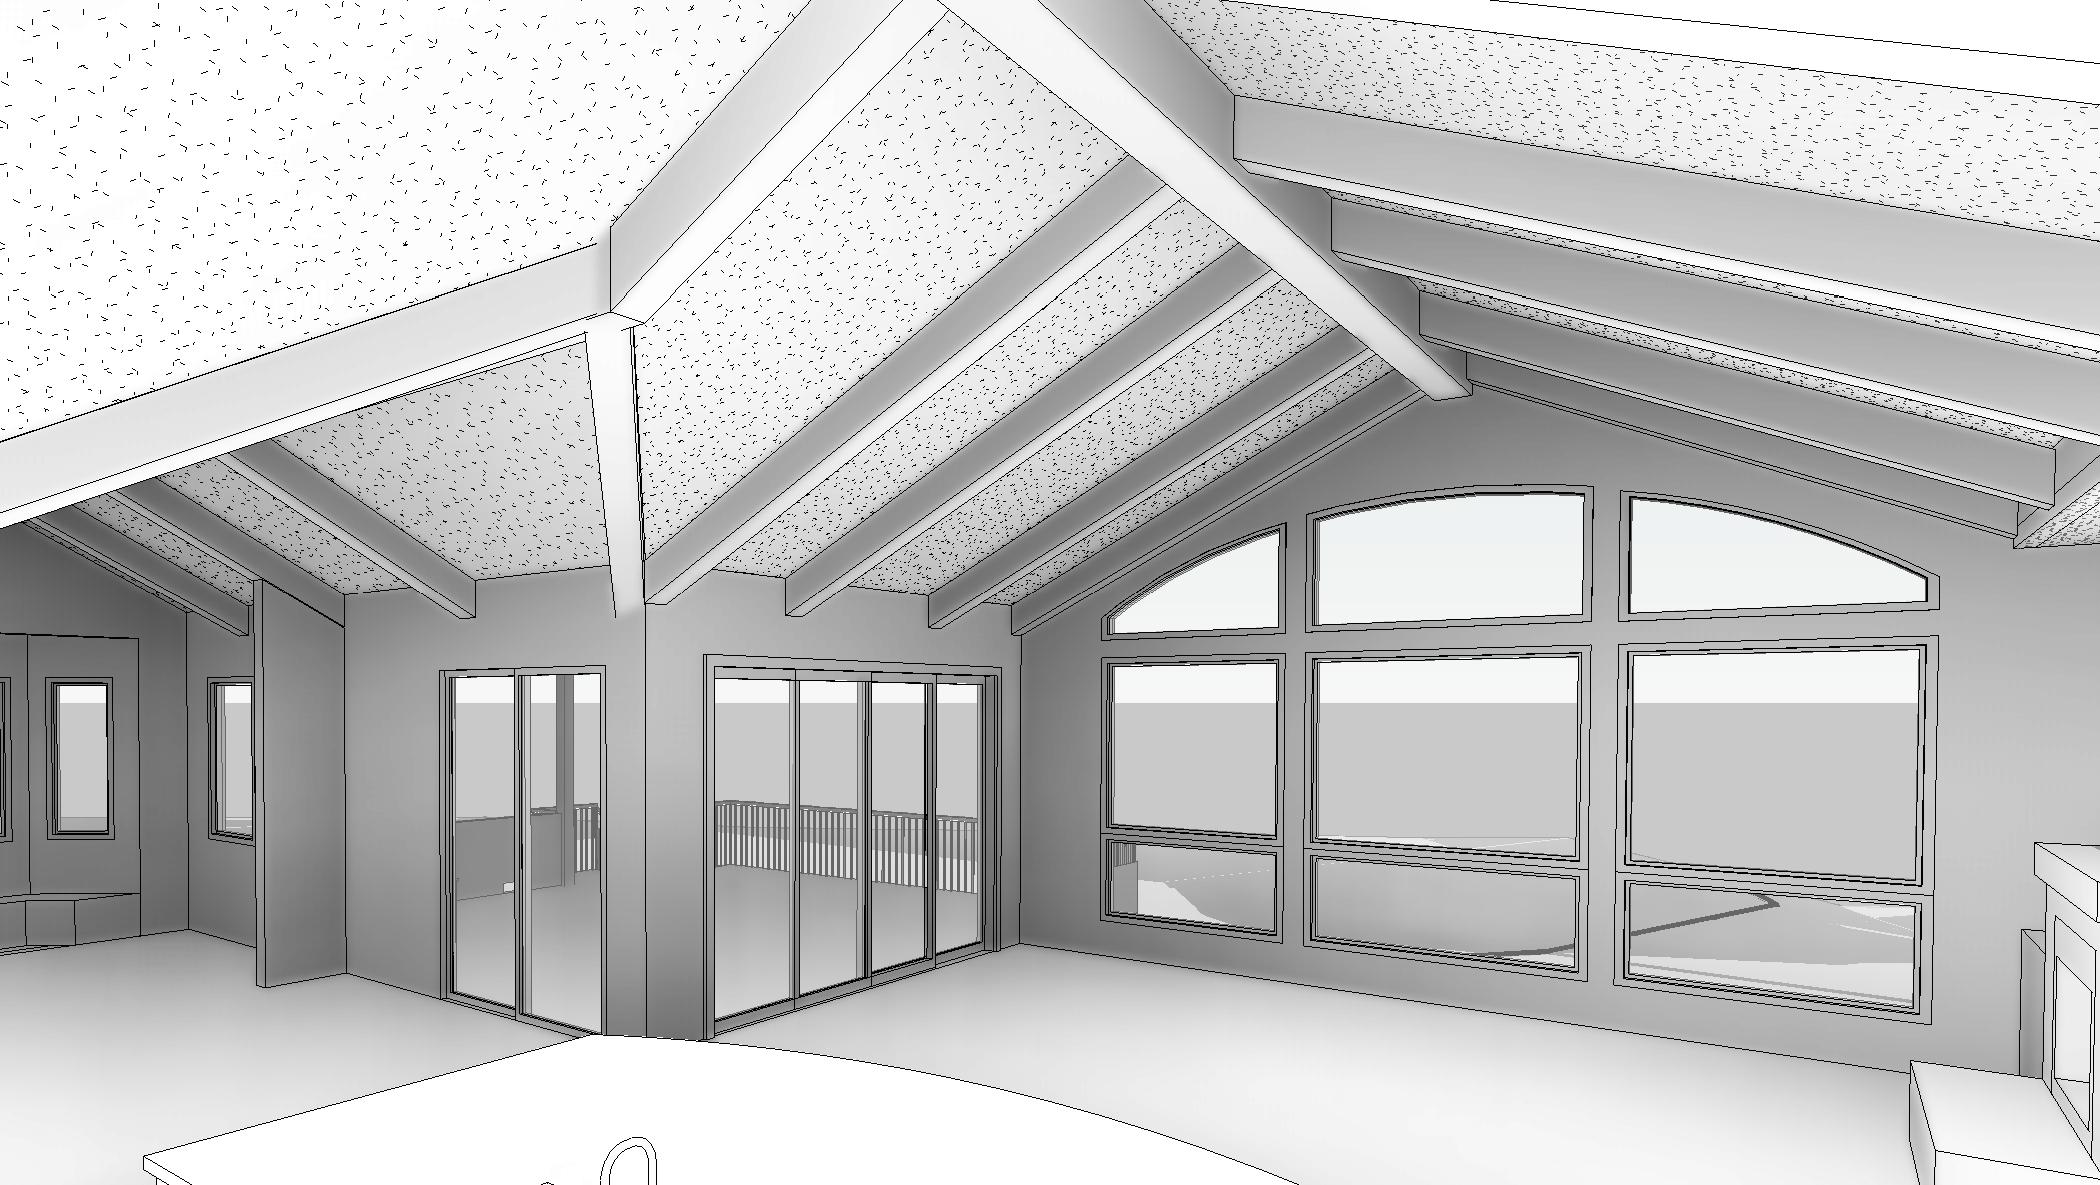 Sanchez Residence_21 - 3D View - INTERIOR 2.jpg